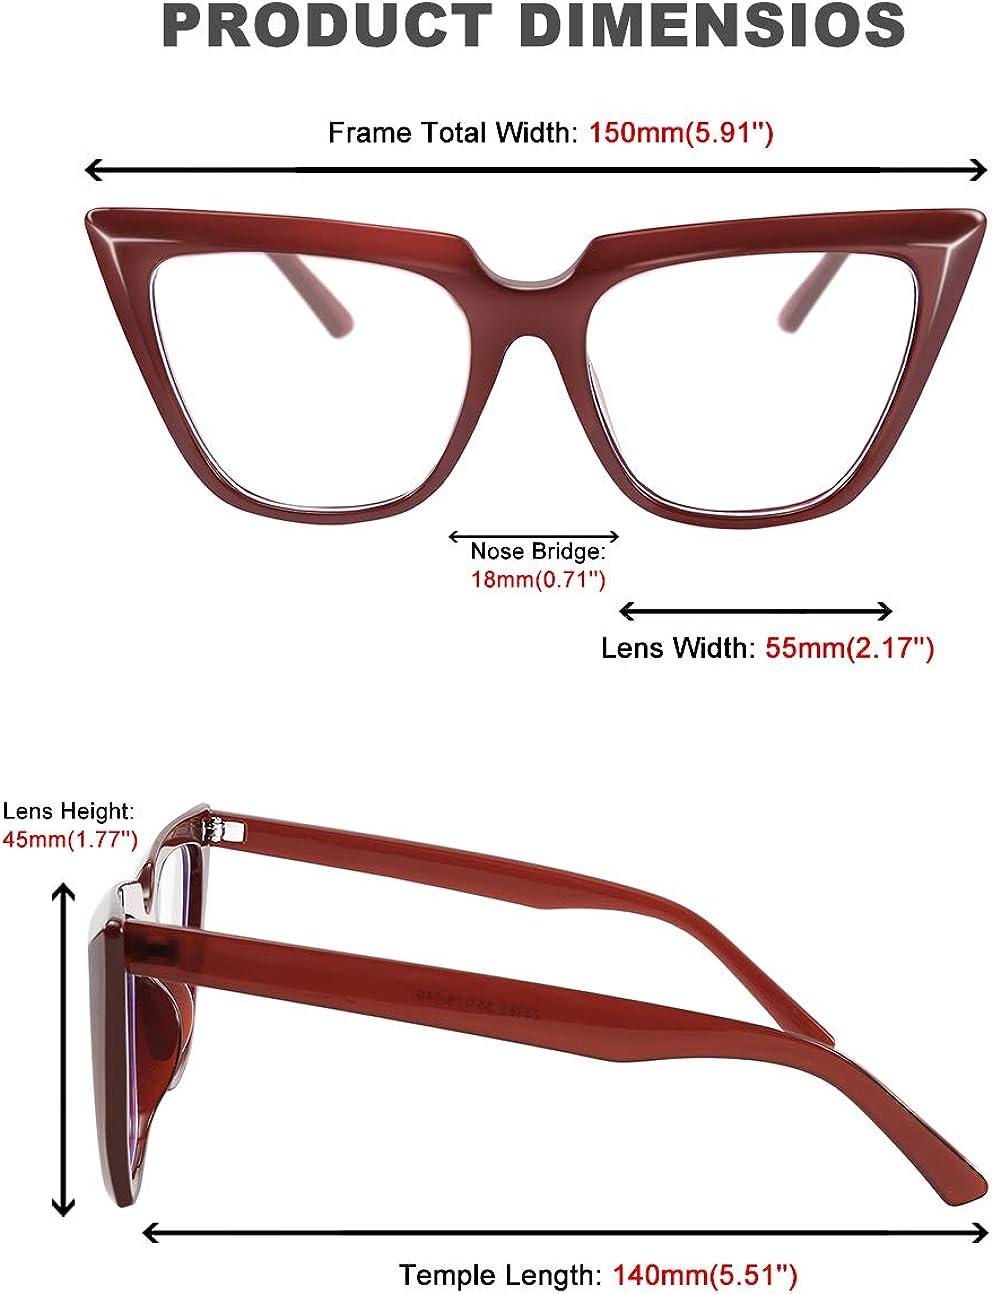 FEISEDY CHIC Cateye Blue Light Blocking Eyewear Glasses with clear Non-prescription Glasses Women B2619